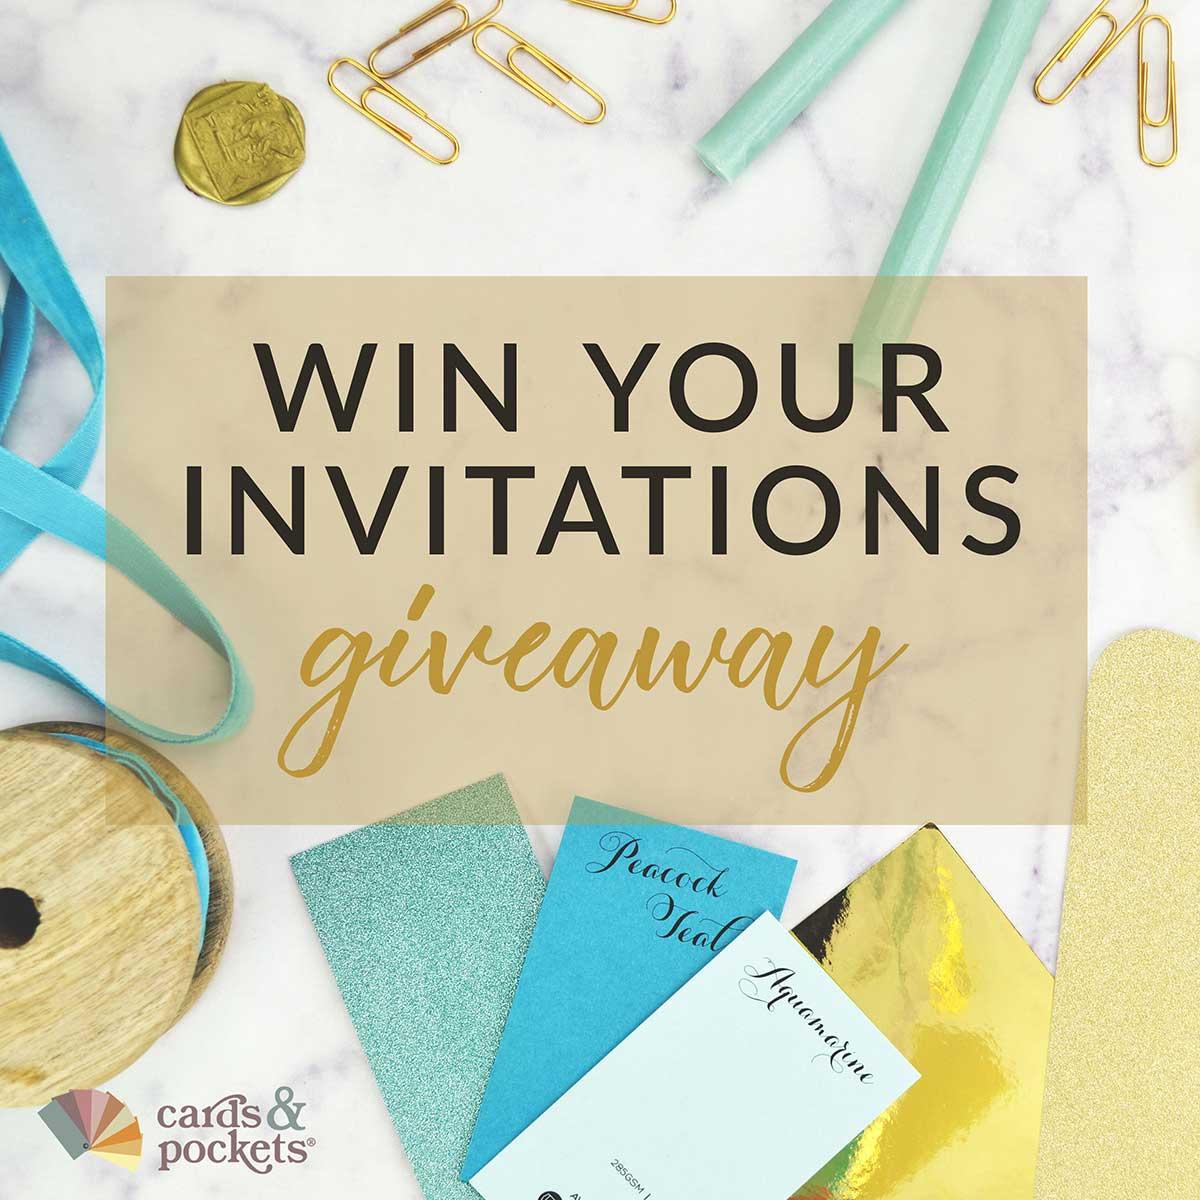 Win Your Wedding Invitations 2018 Instagram Contest